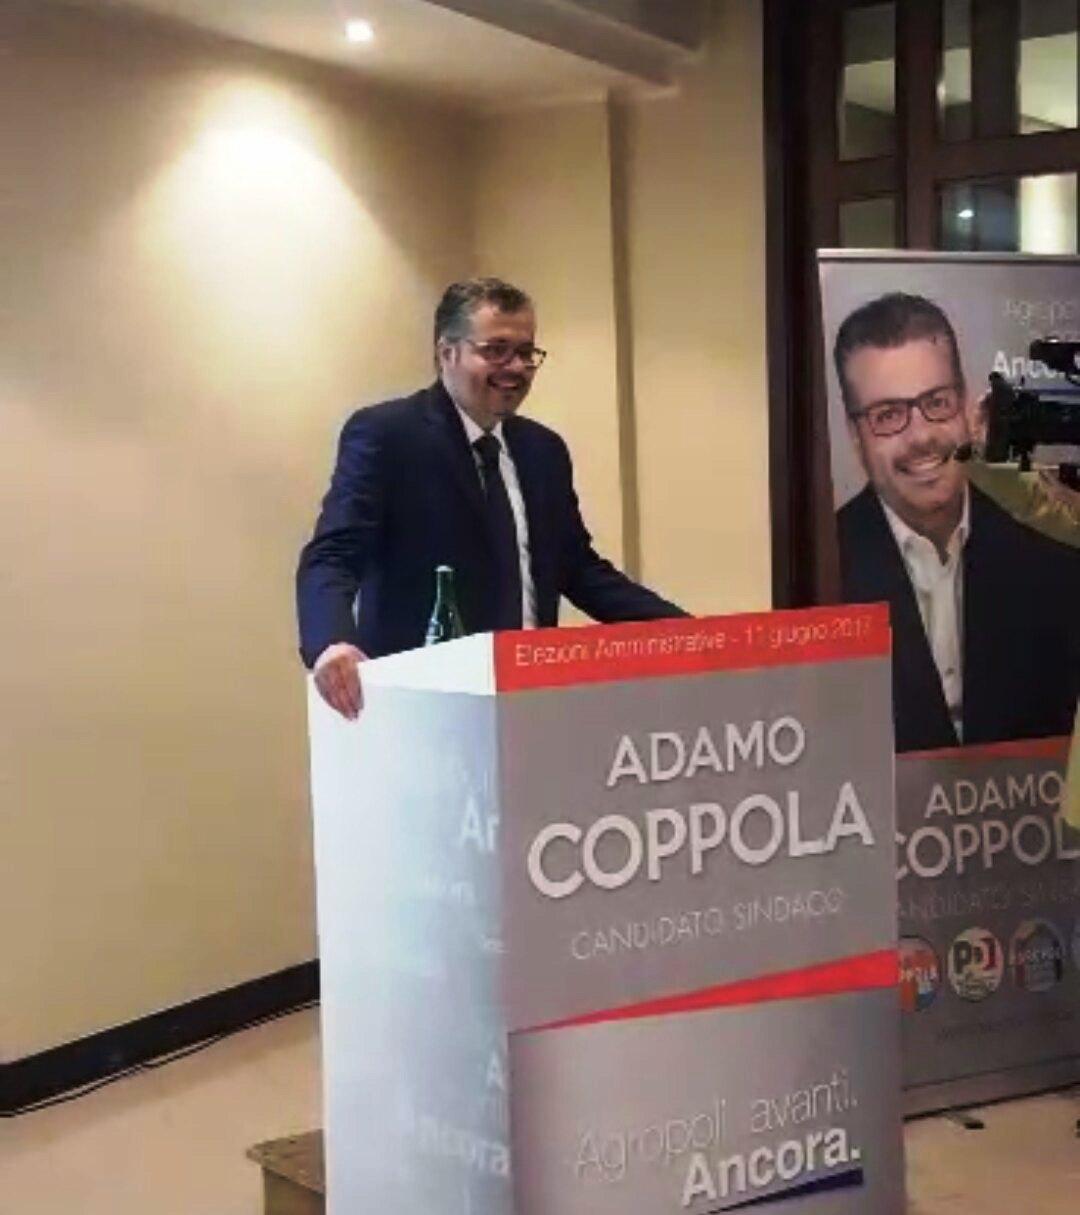 Adamo-coppola